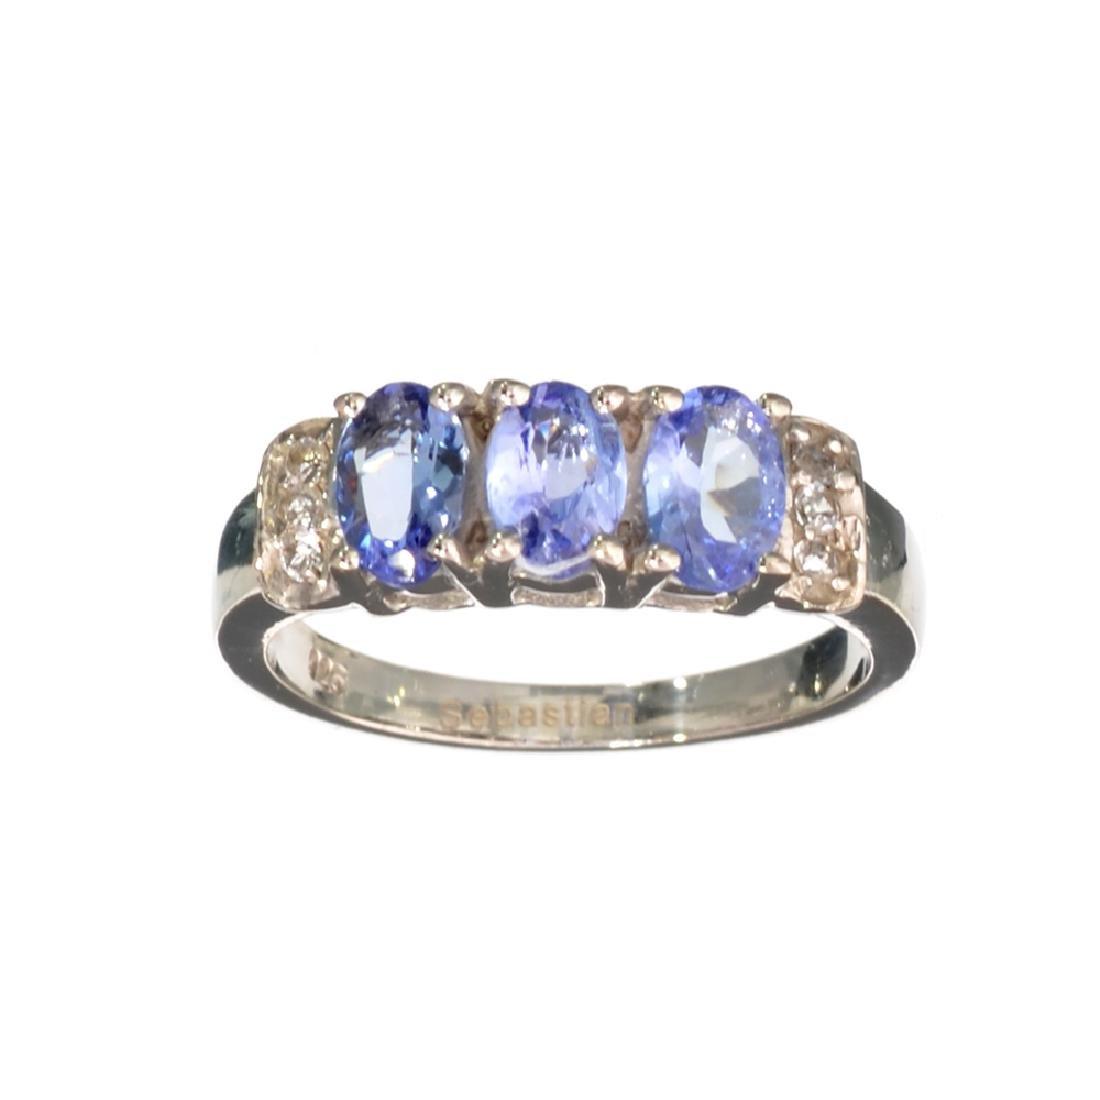 APP: 1.4k Fine Jewelry 1.40CT Oval Cut Tanzanite And